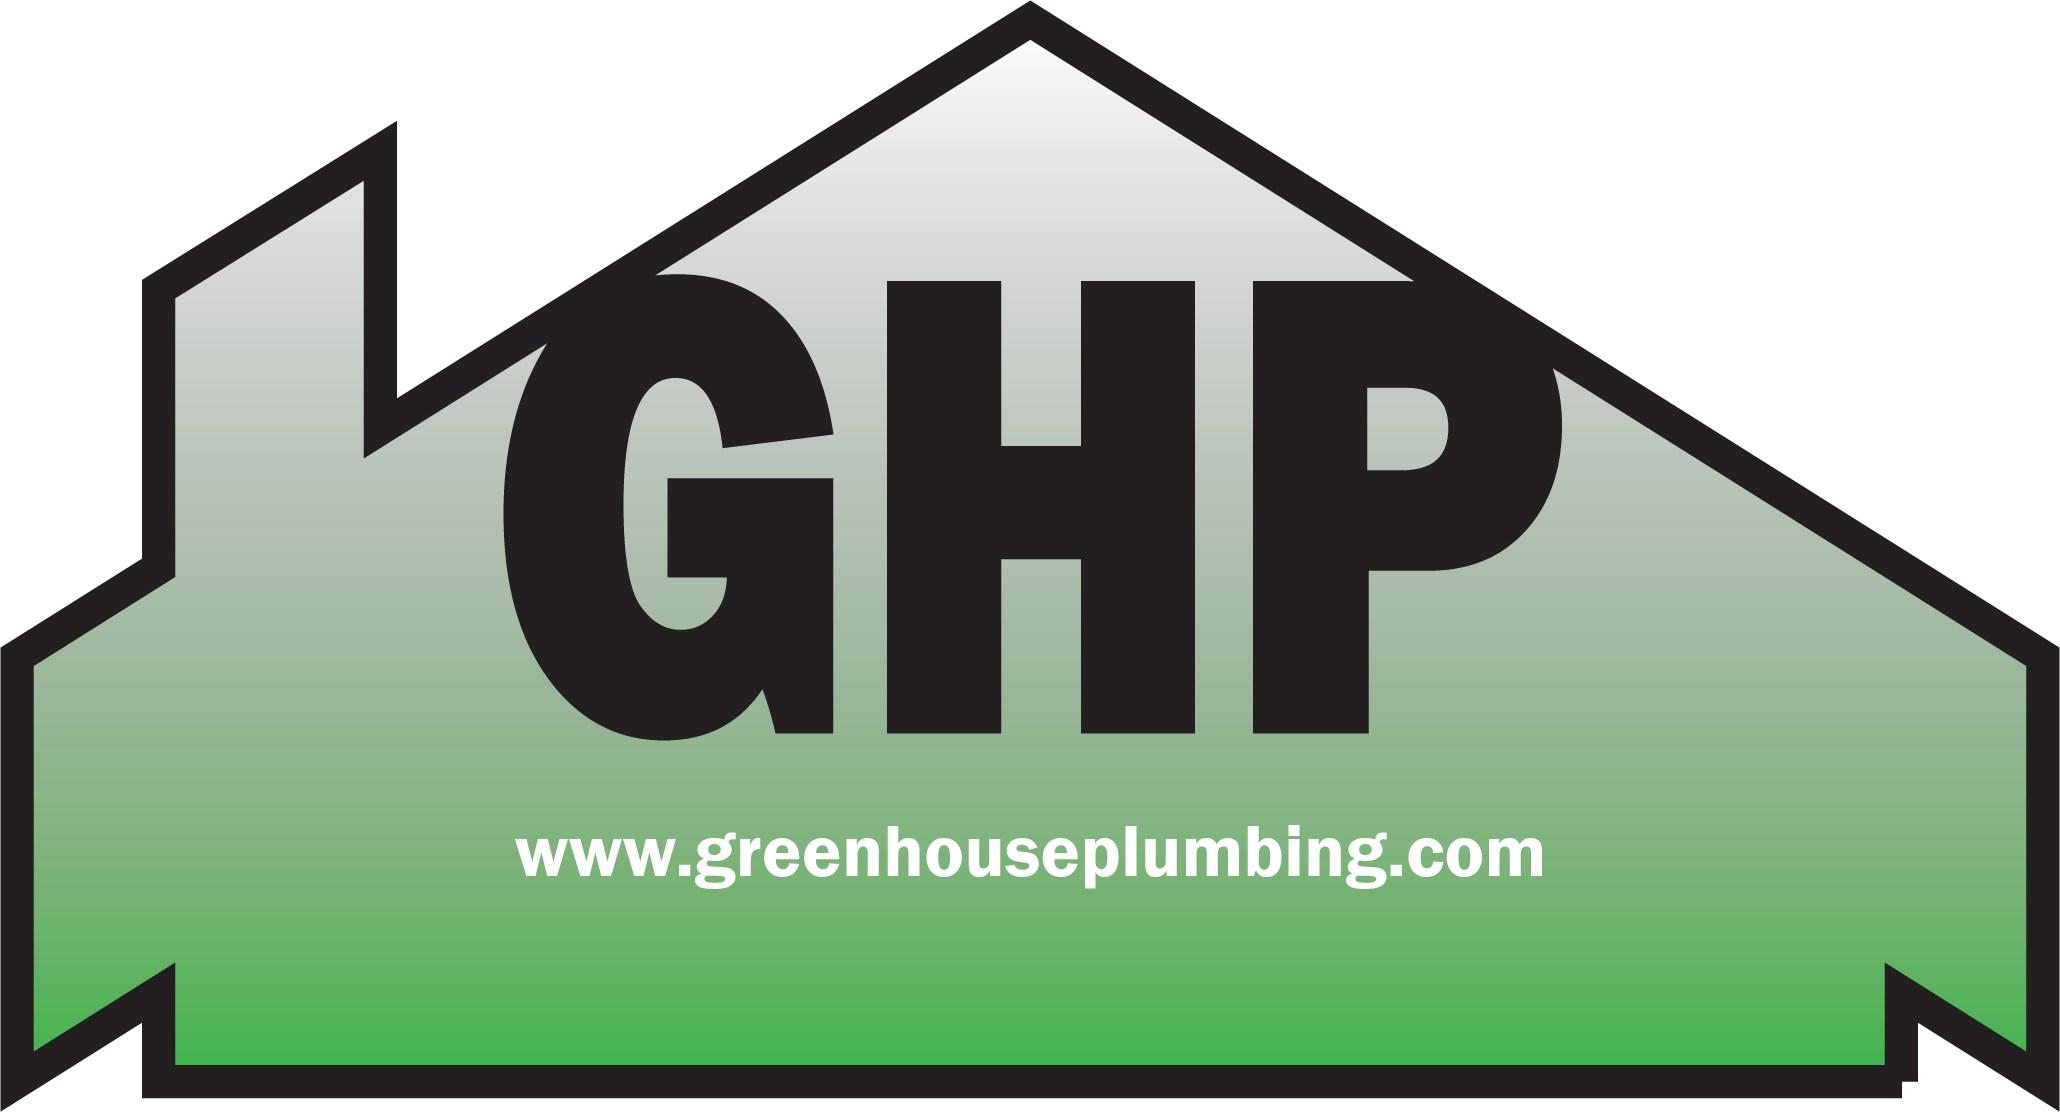 Green House Plumbing and Heating logo